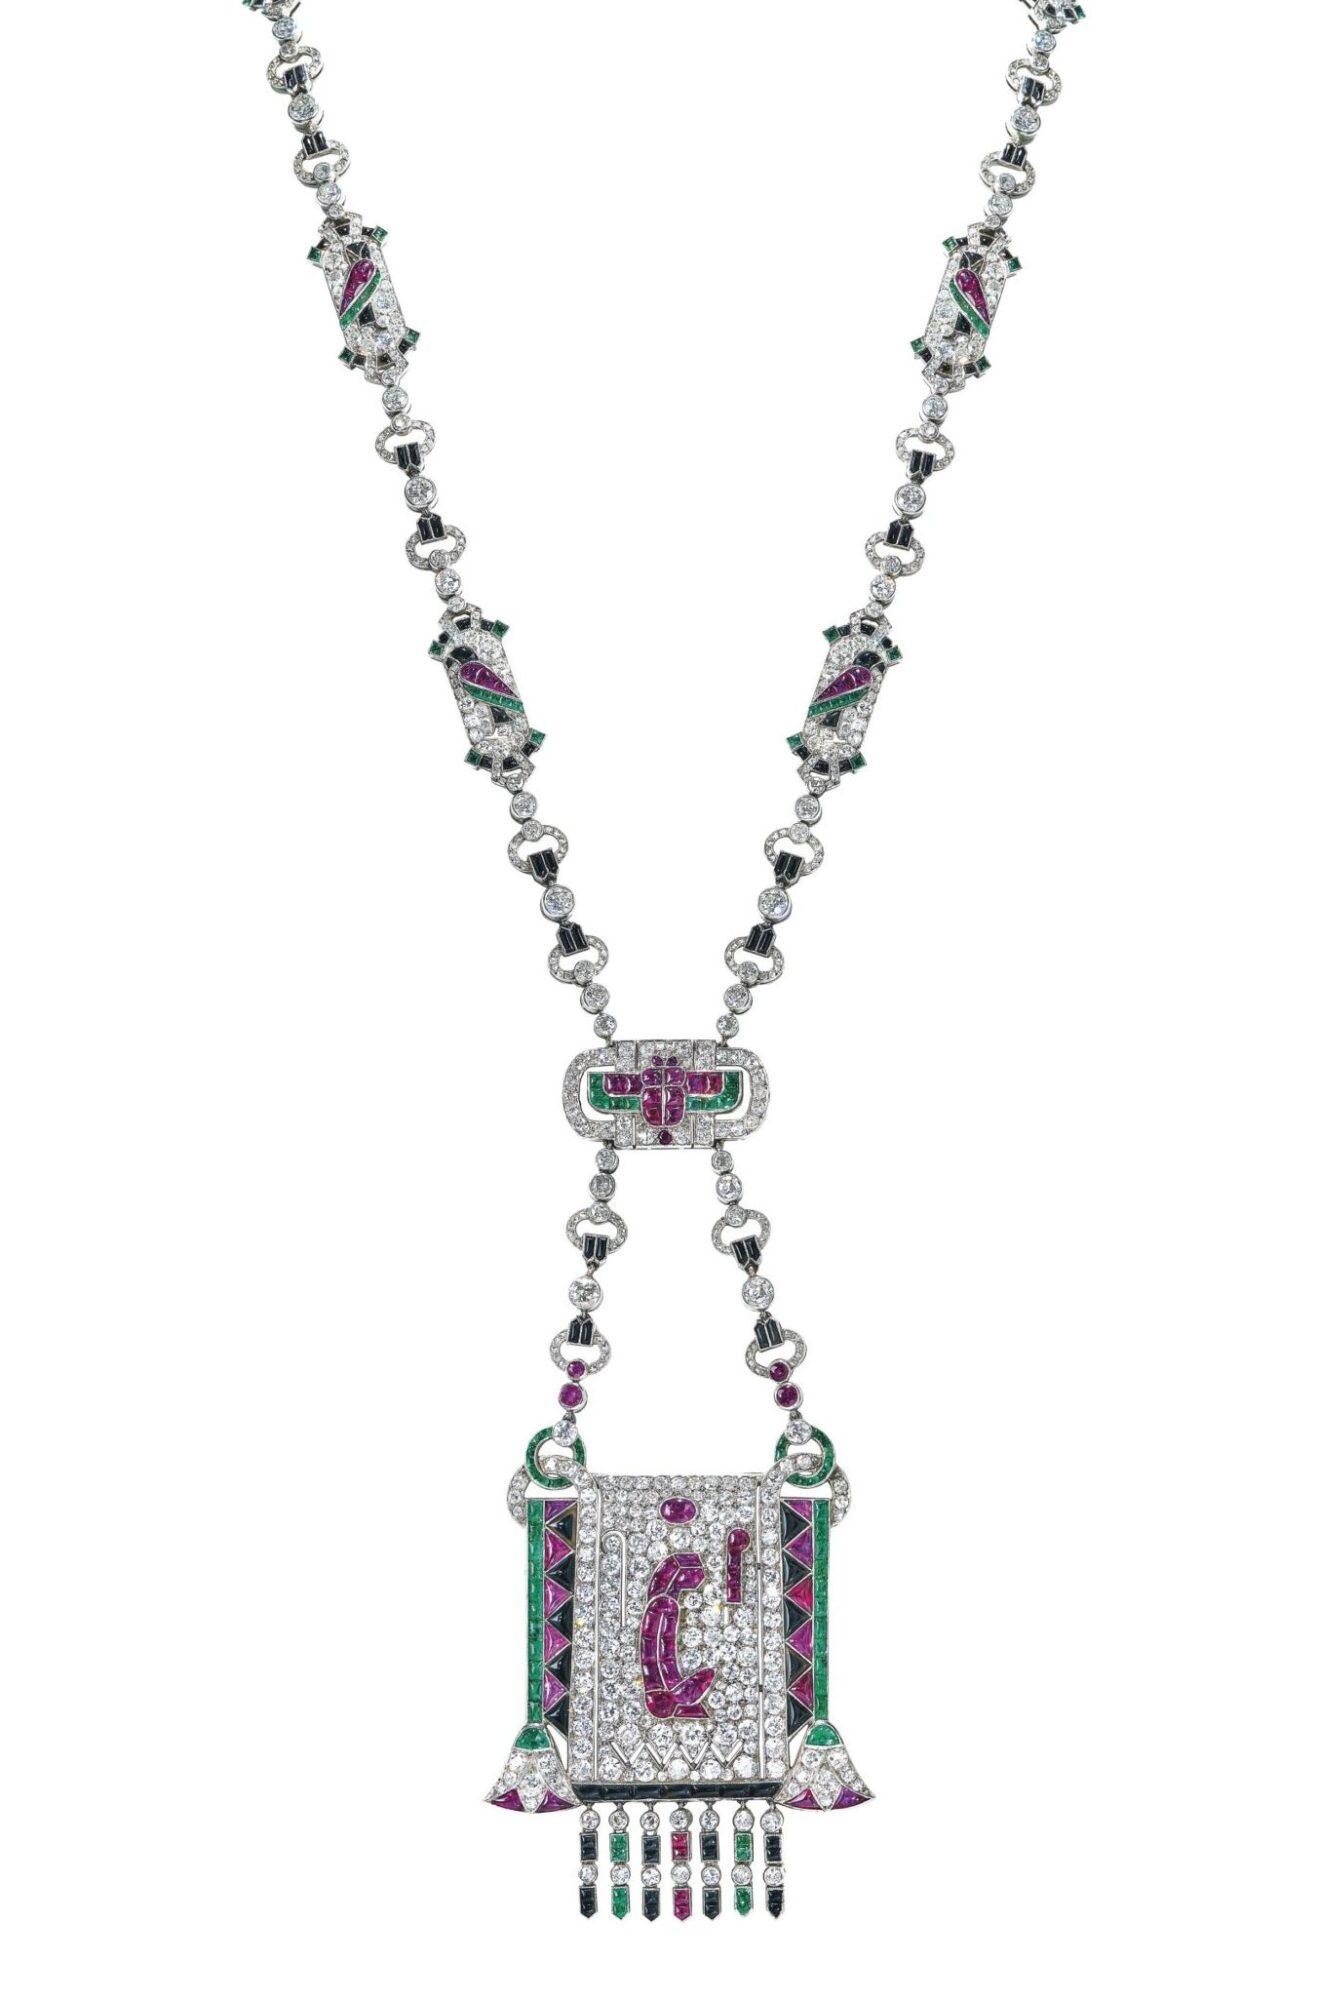 Egyptian revival pendant sautoir by Van Cleef&Arpels, estimate CHF2,000,000-3,000,000